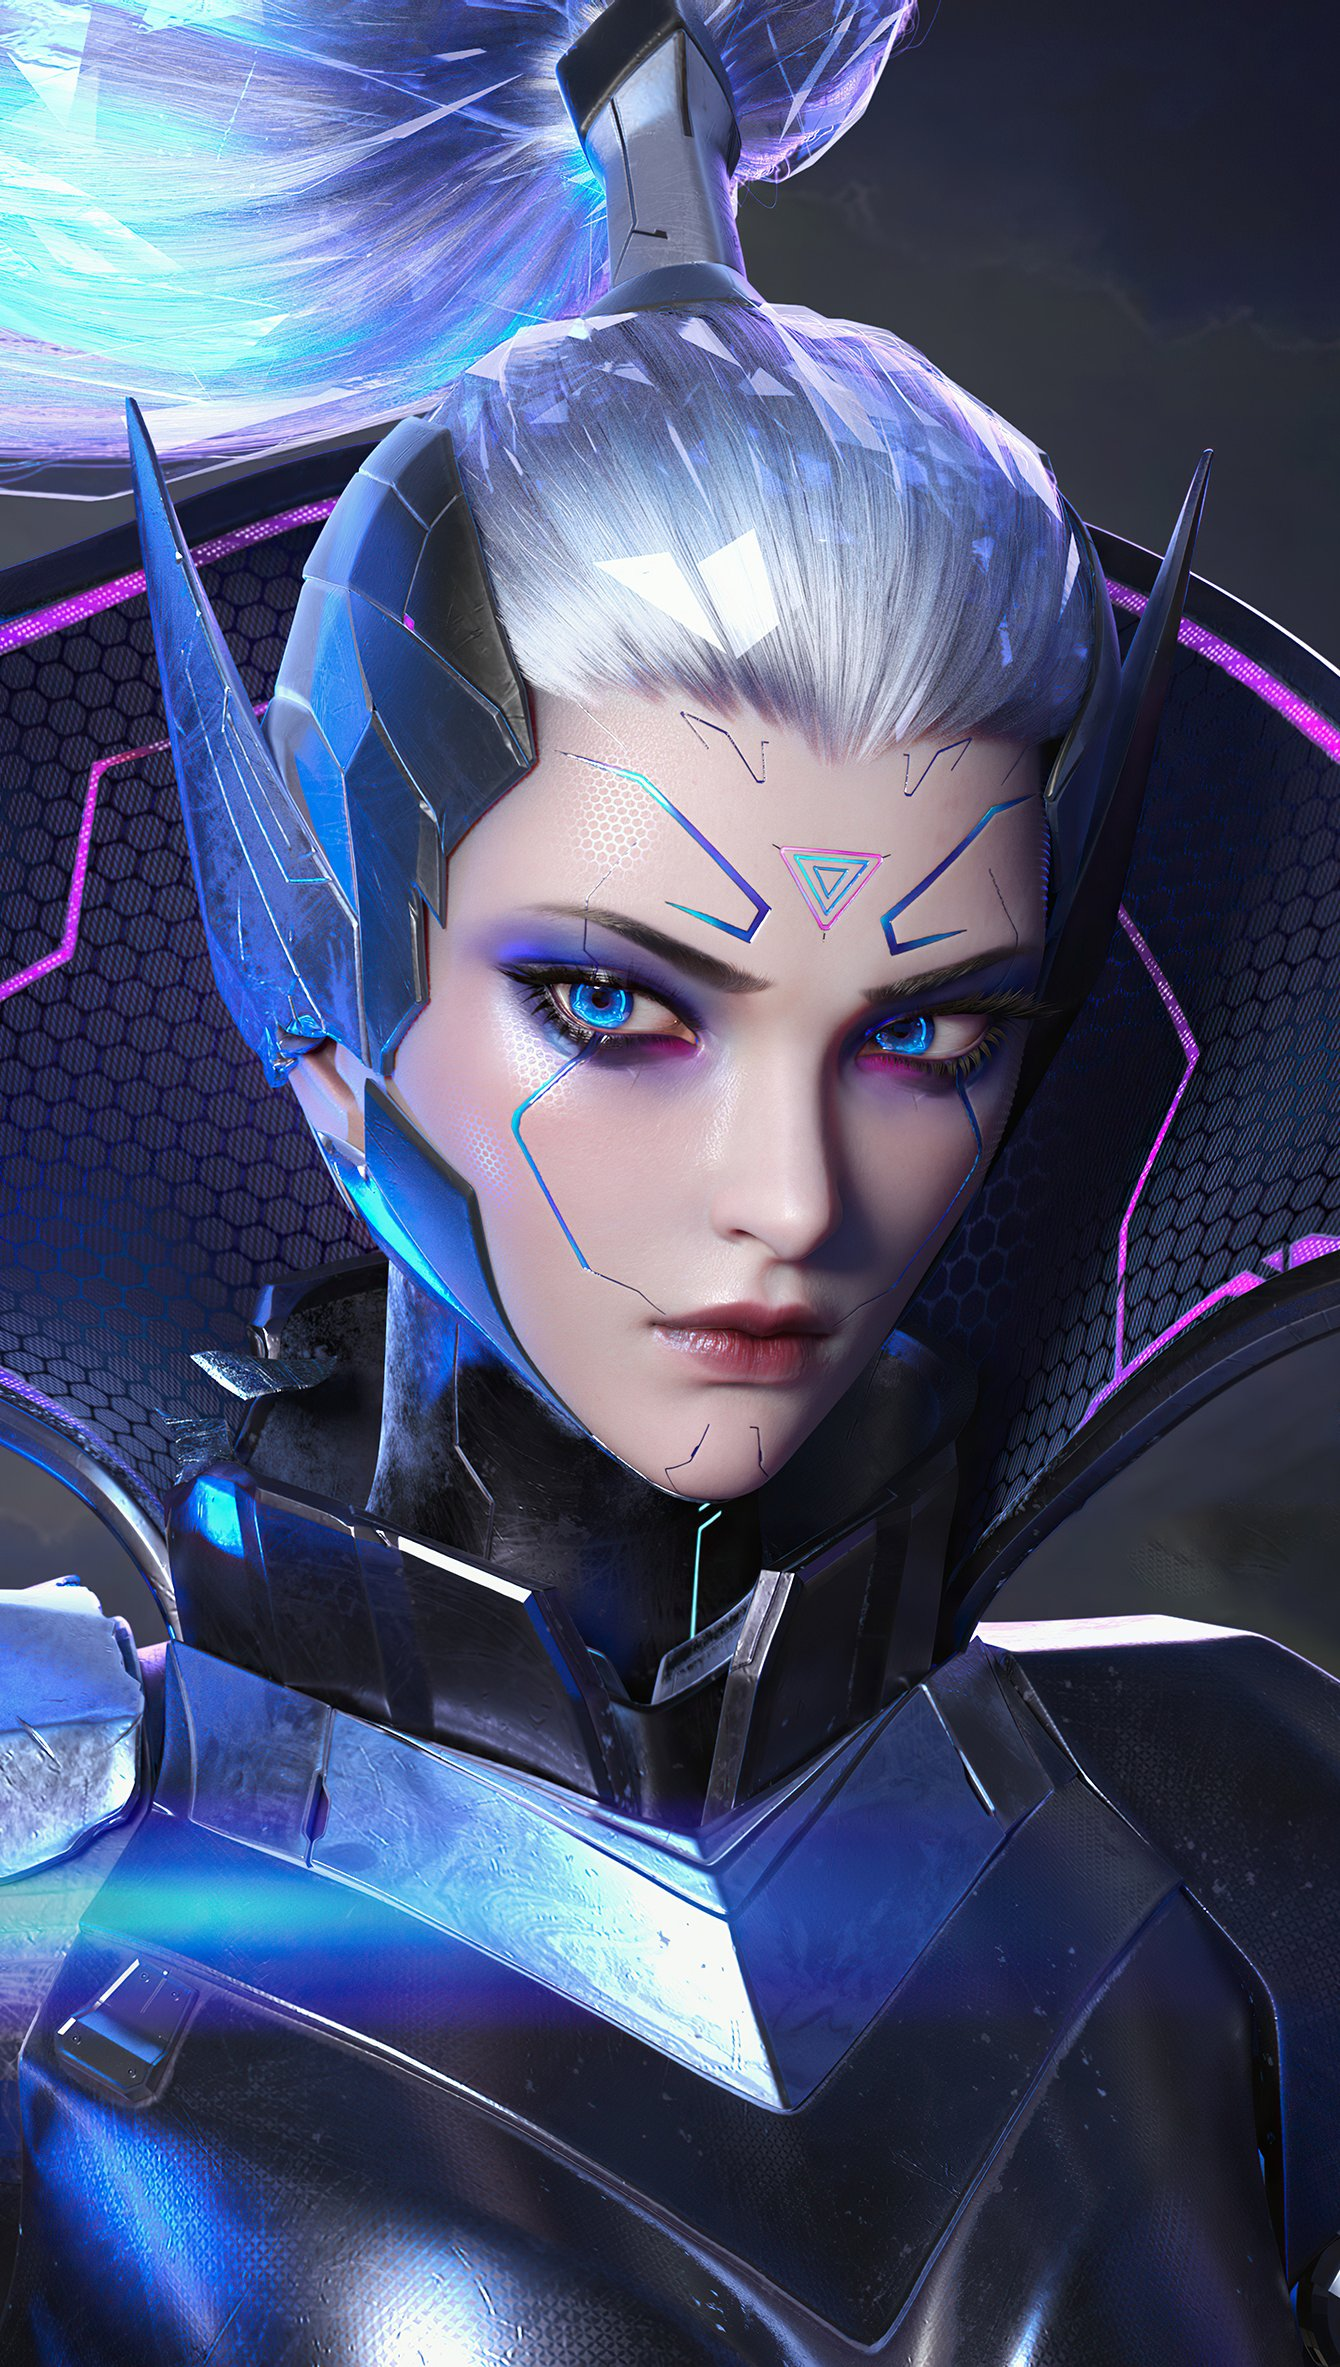 Fondos de pantalla Retrato de Vayne League of Legends Vertical